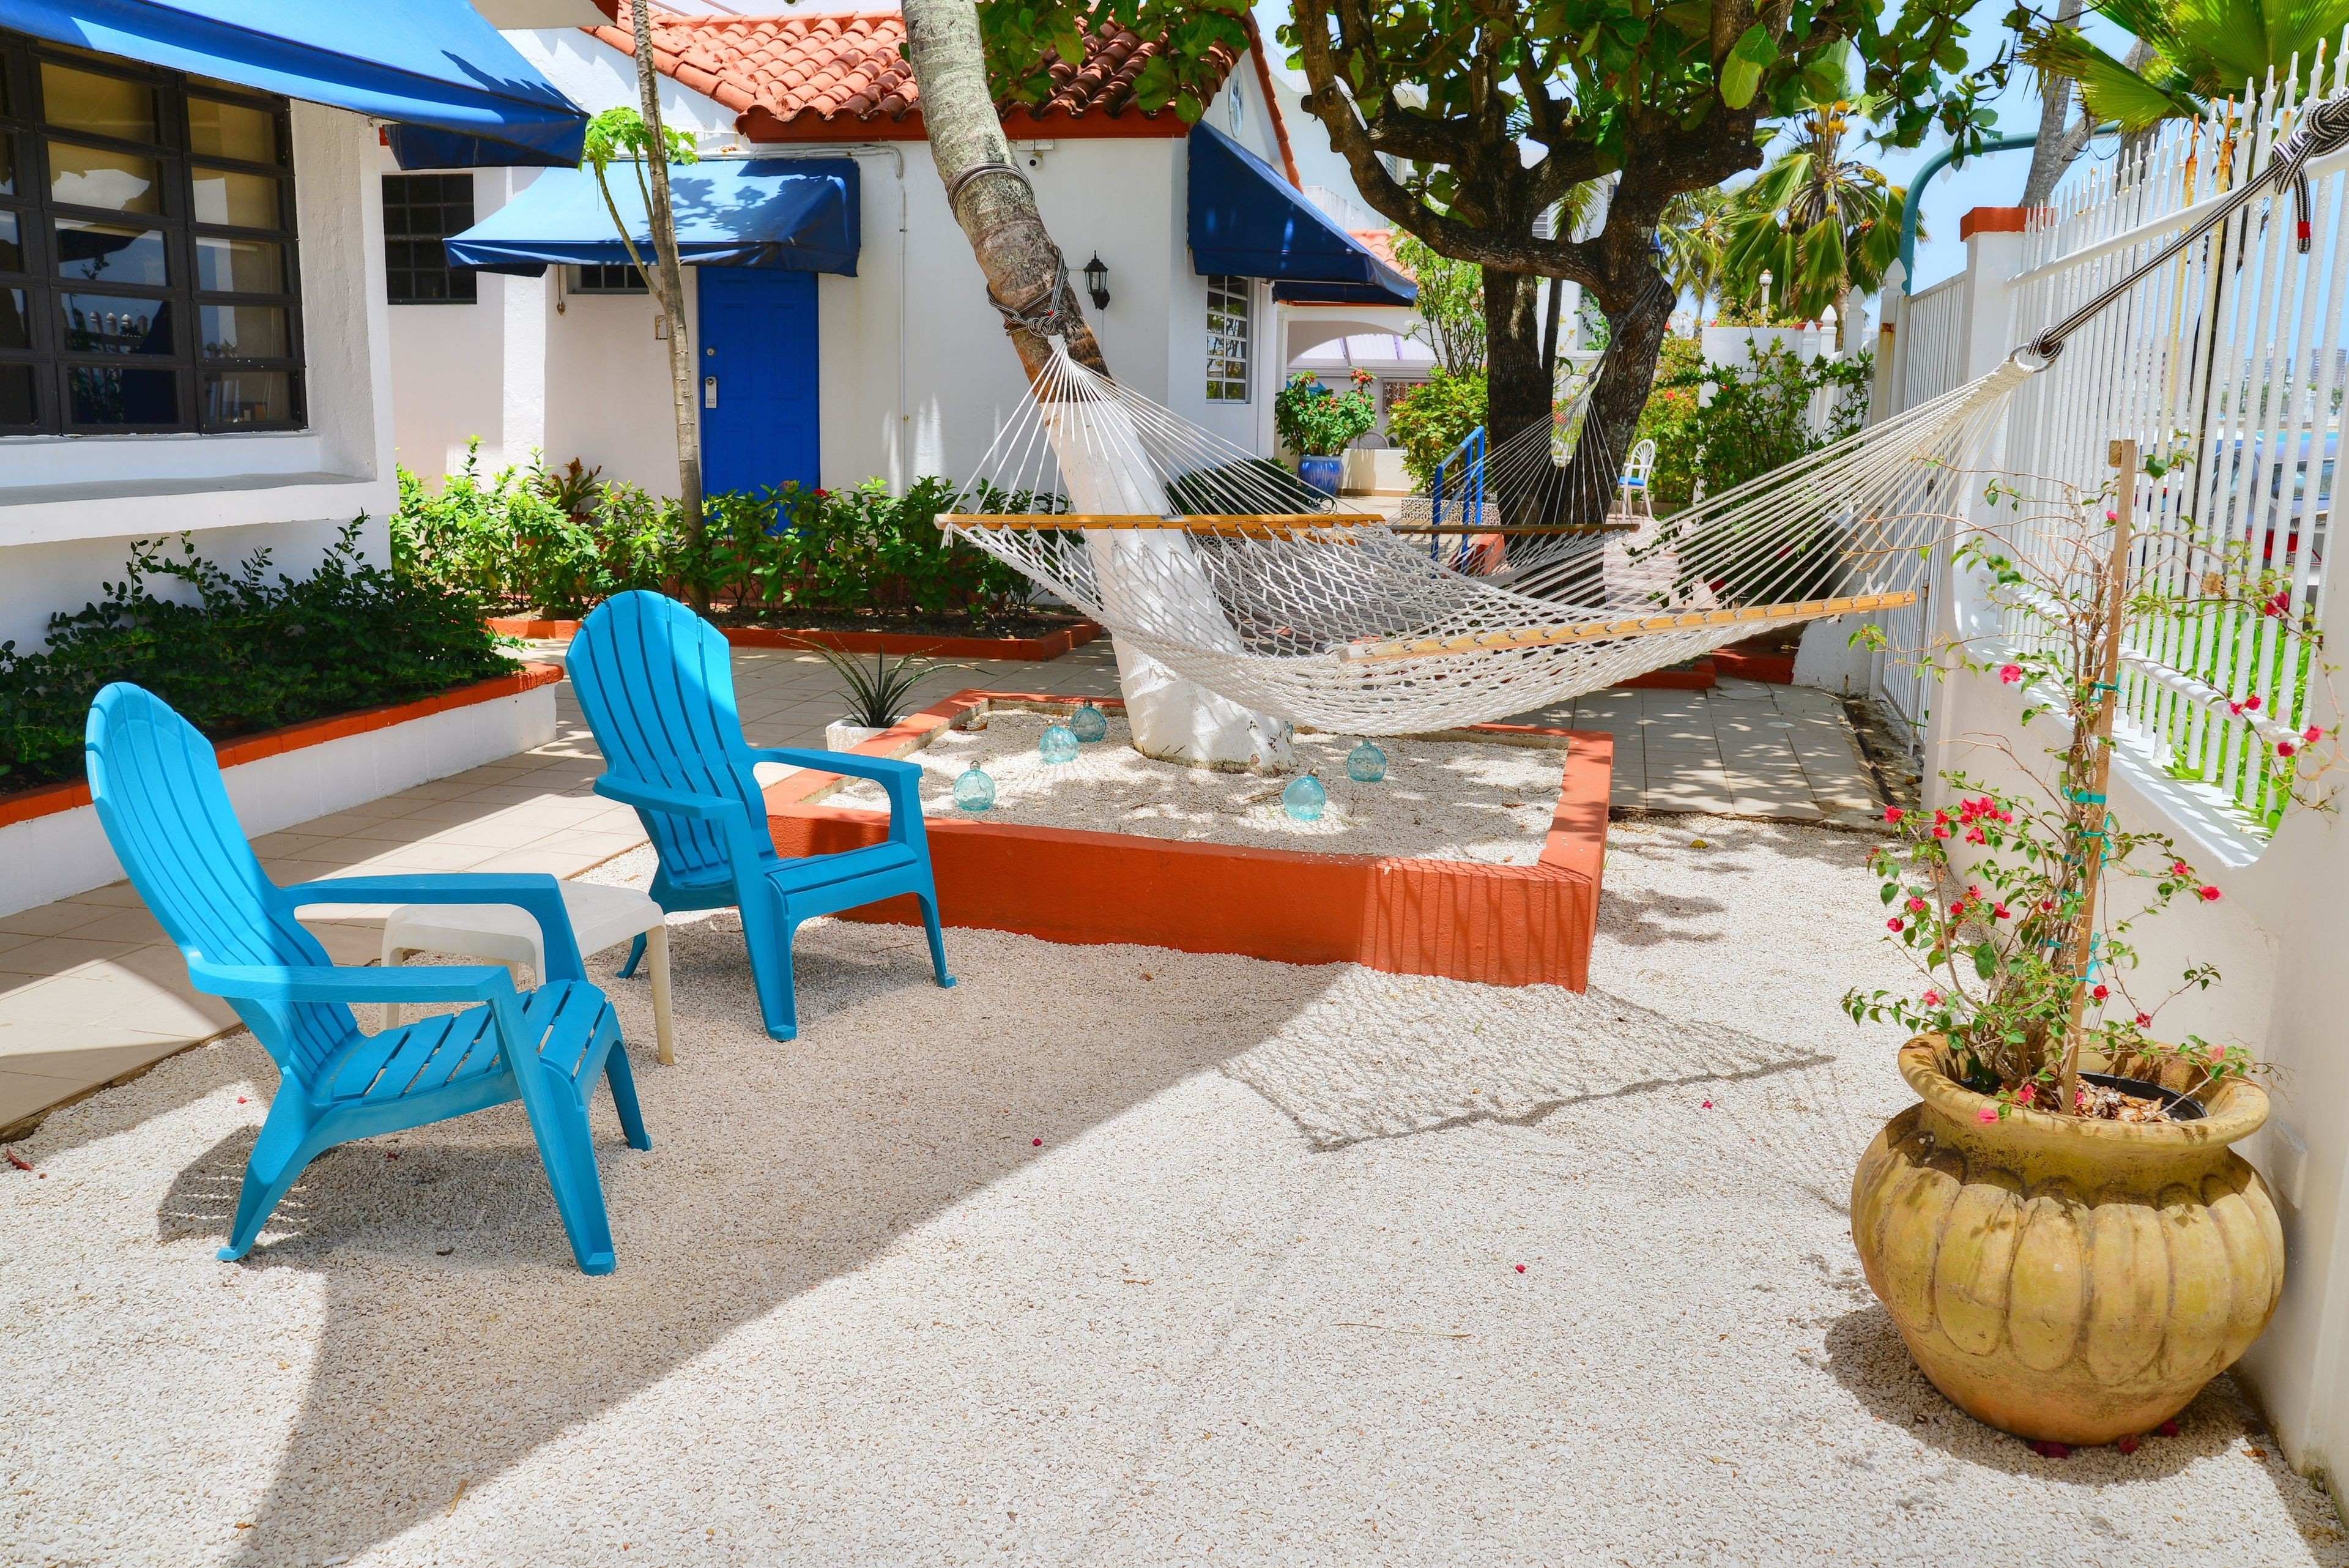 Courtesy of Tres Palmas Inn / Expedia